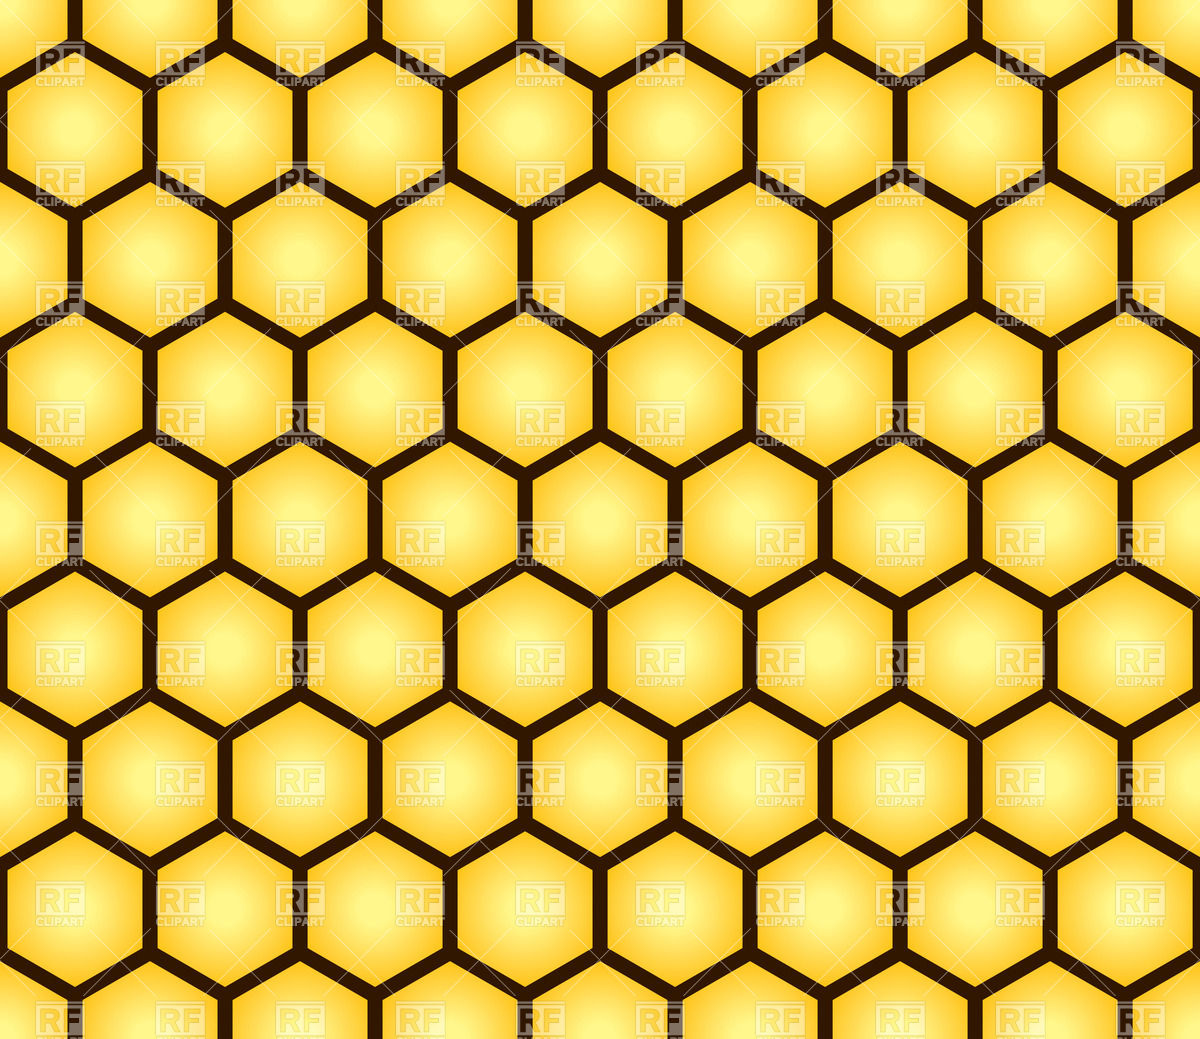 1200x1039 Honeycomb Seamless Pattern Vector Image Vector Artwork Of